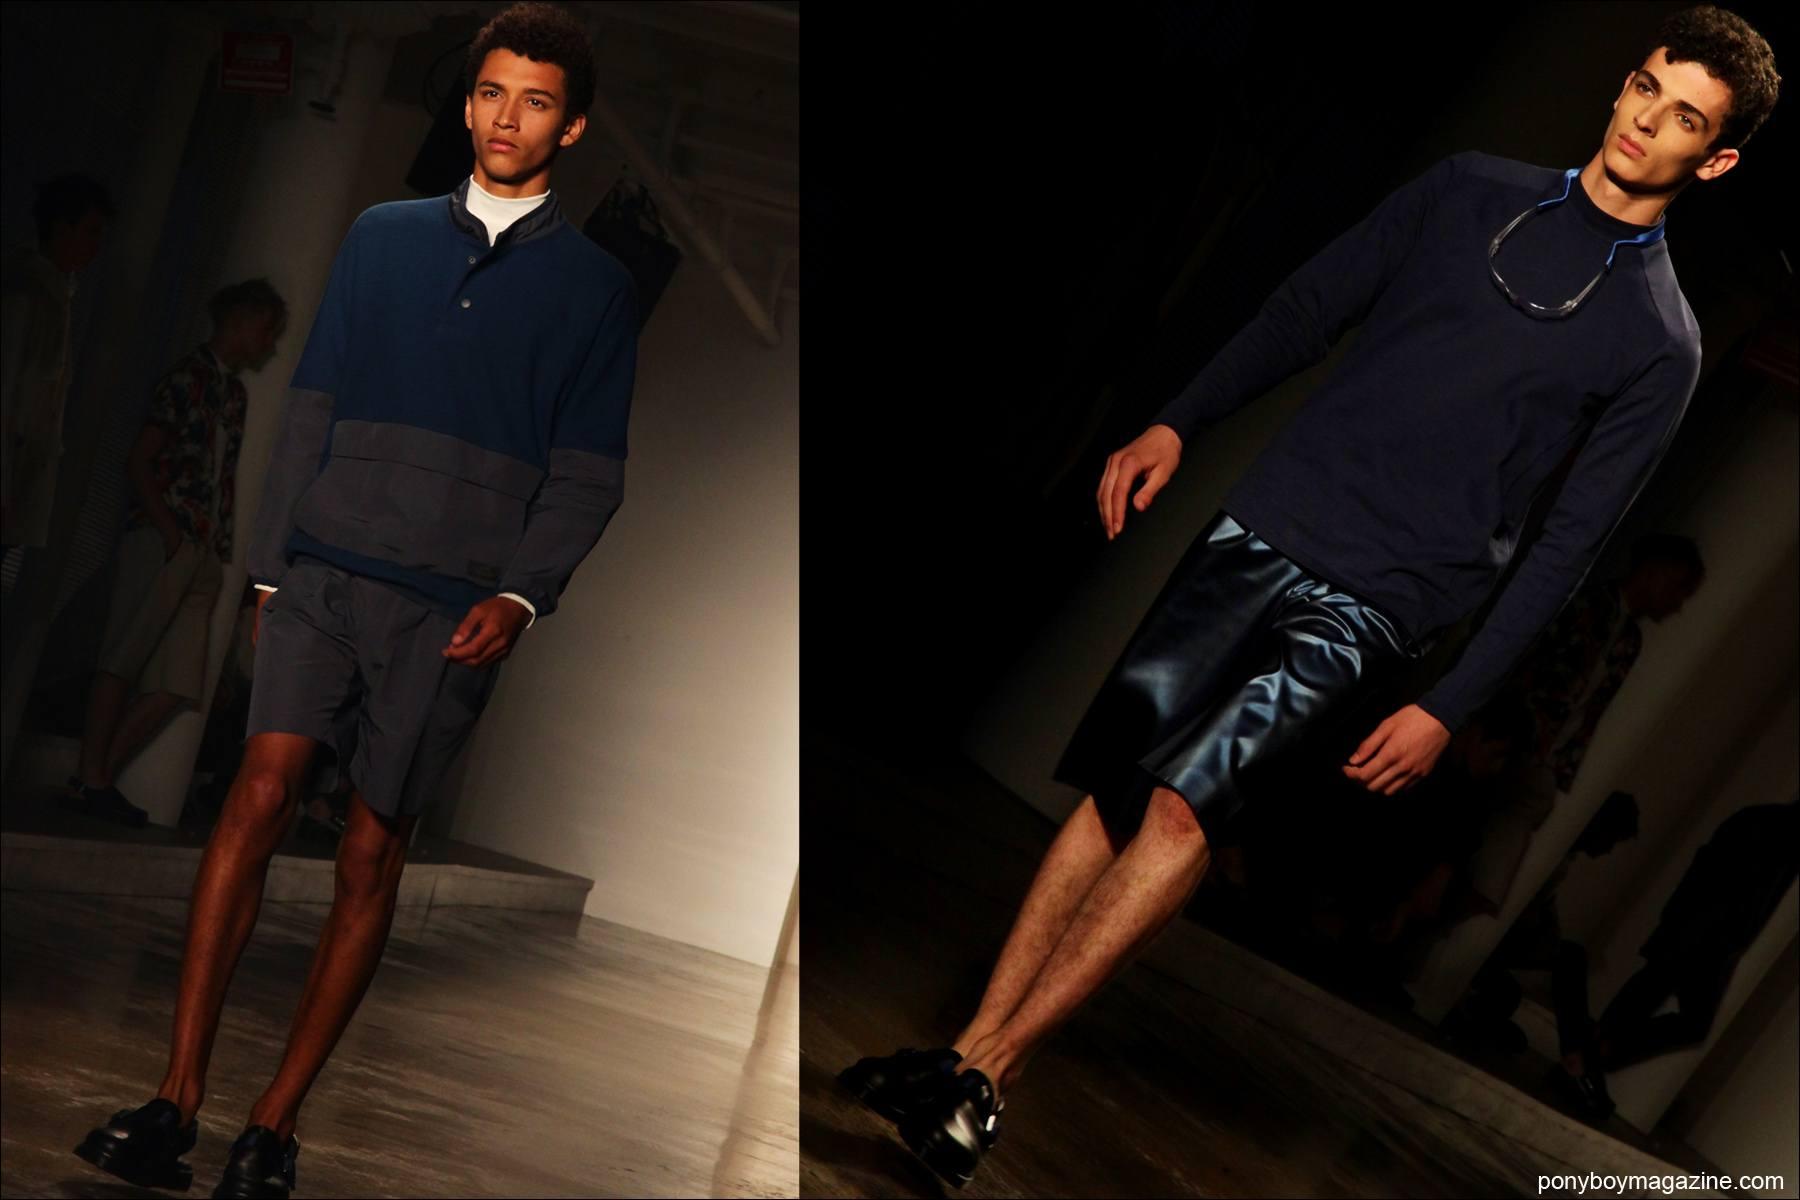 Male models walk in Spring/Summer 2015 clothing by menswear designer Patrik Ervell at Milk Studios NY. Photographs by Alexander Thompson for Ponyboy Magazine.